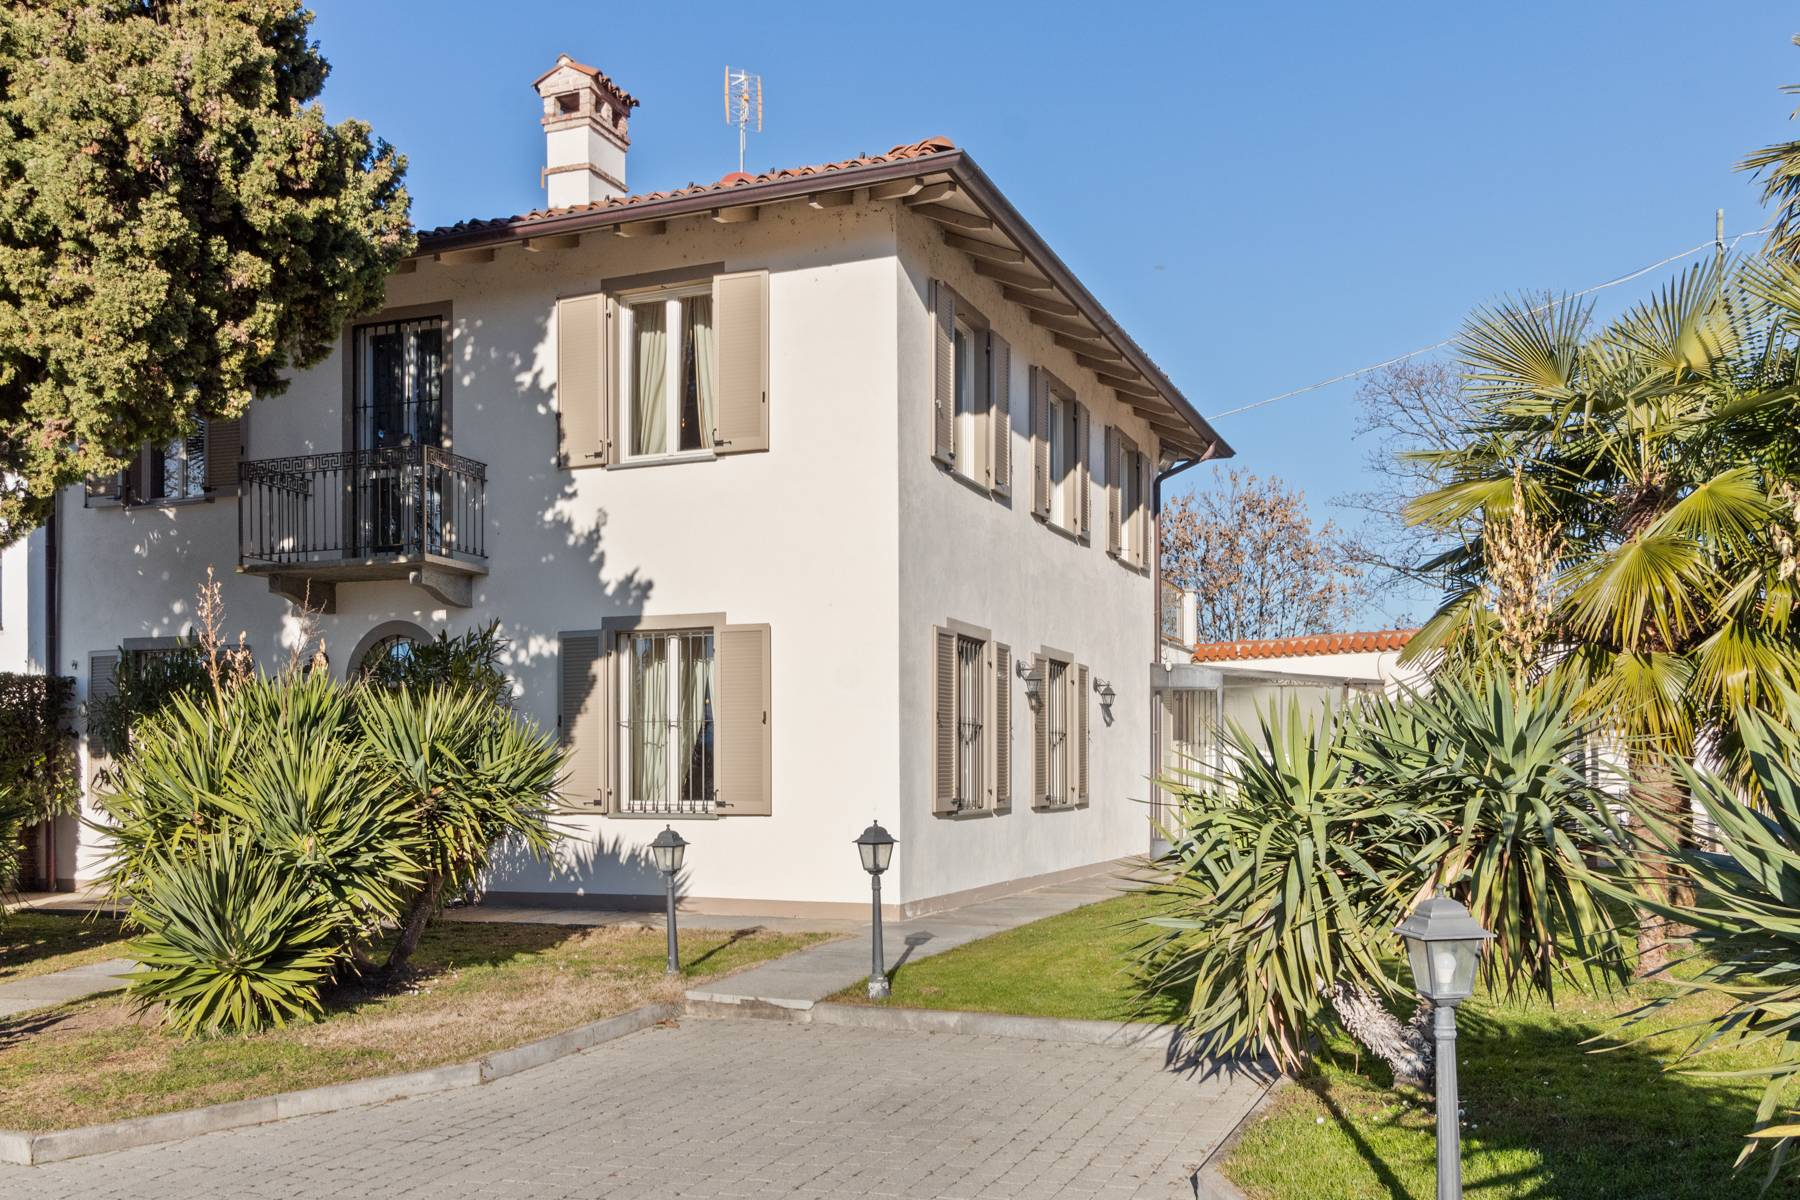 Casa indipendente in Vendita a Torino: 5 locali, 270 mq - Foto 1